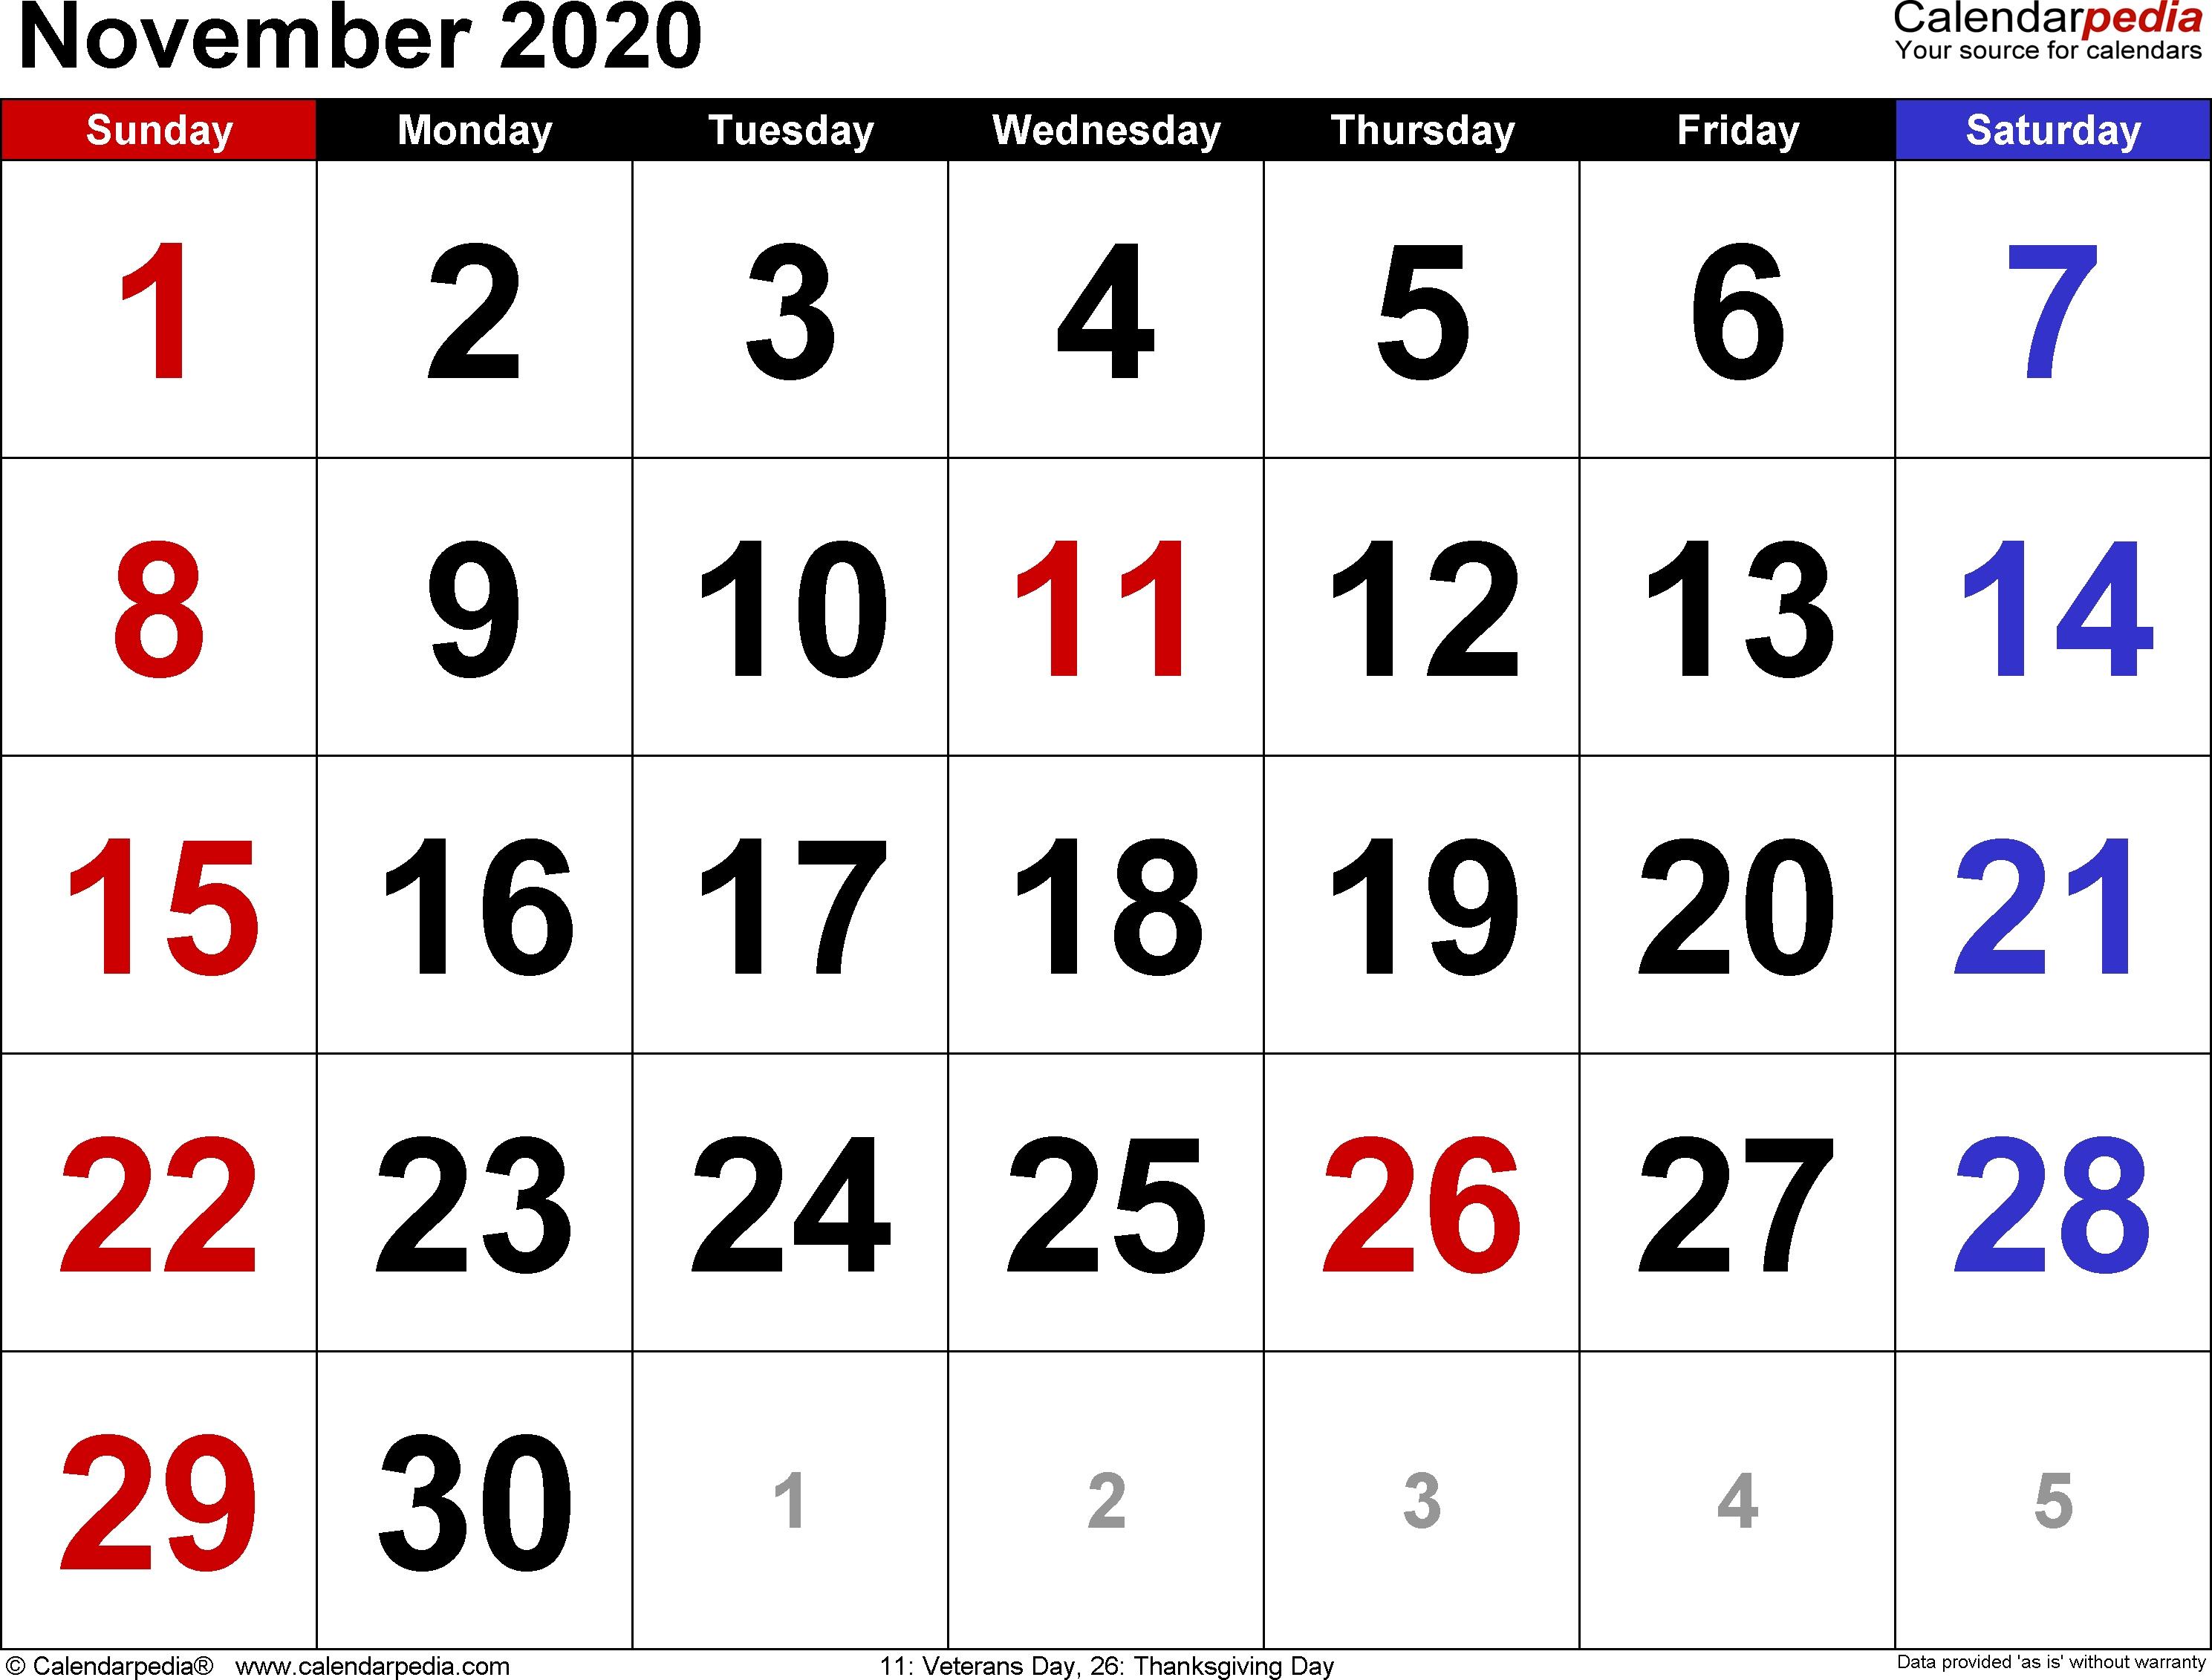 November 2020 Calendars For Word, Excel & Pdf Dashing November 3 2020 Calendar